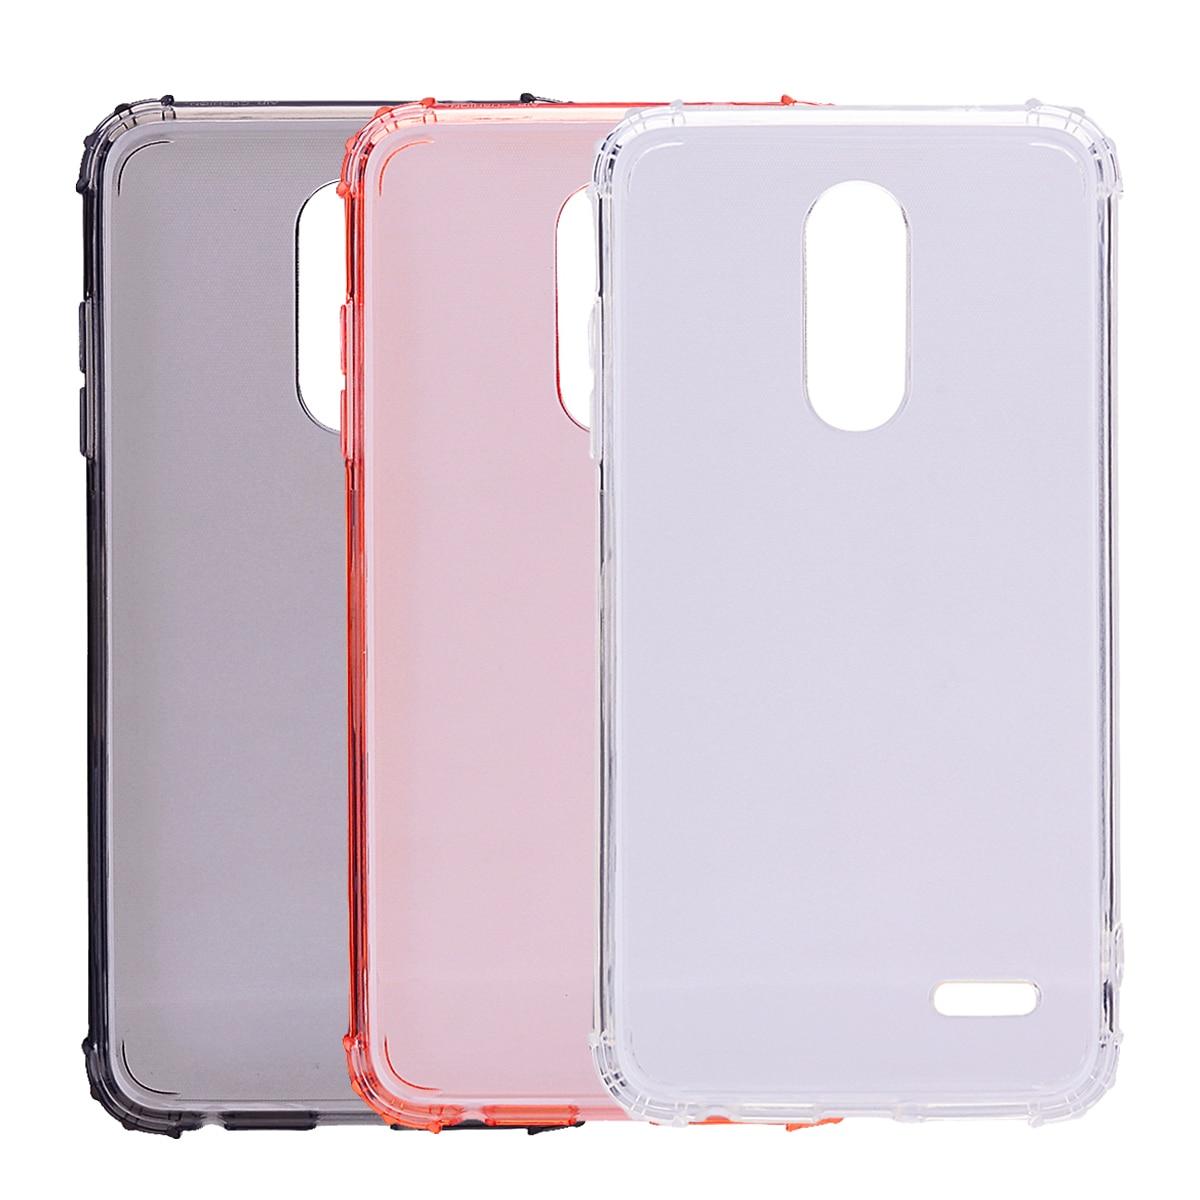 3 Pcs For Cover LG K11 Case Soft TPU Airbag Bumper Housings For LG K10 Plus 2018 Phone Case For LG K10 2018 Cover K10a 5.3''